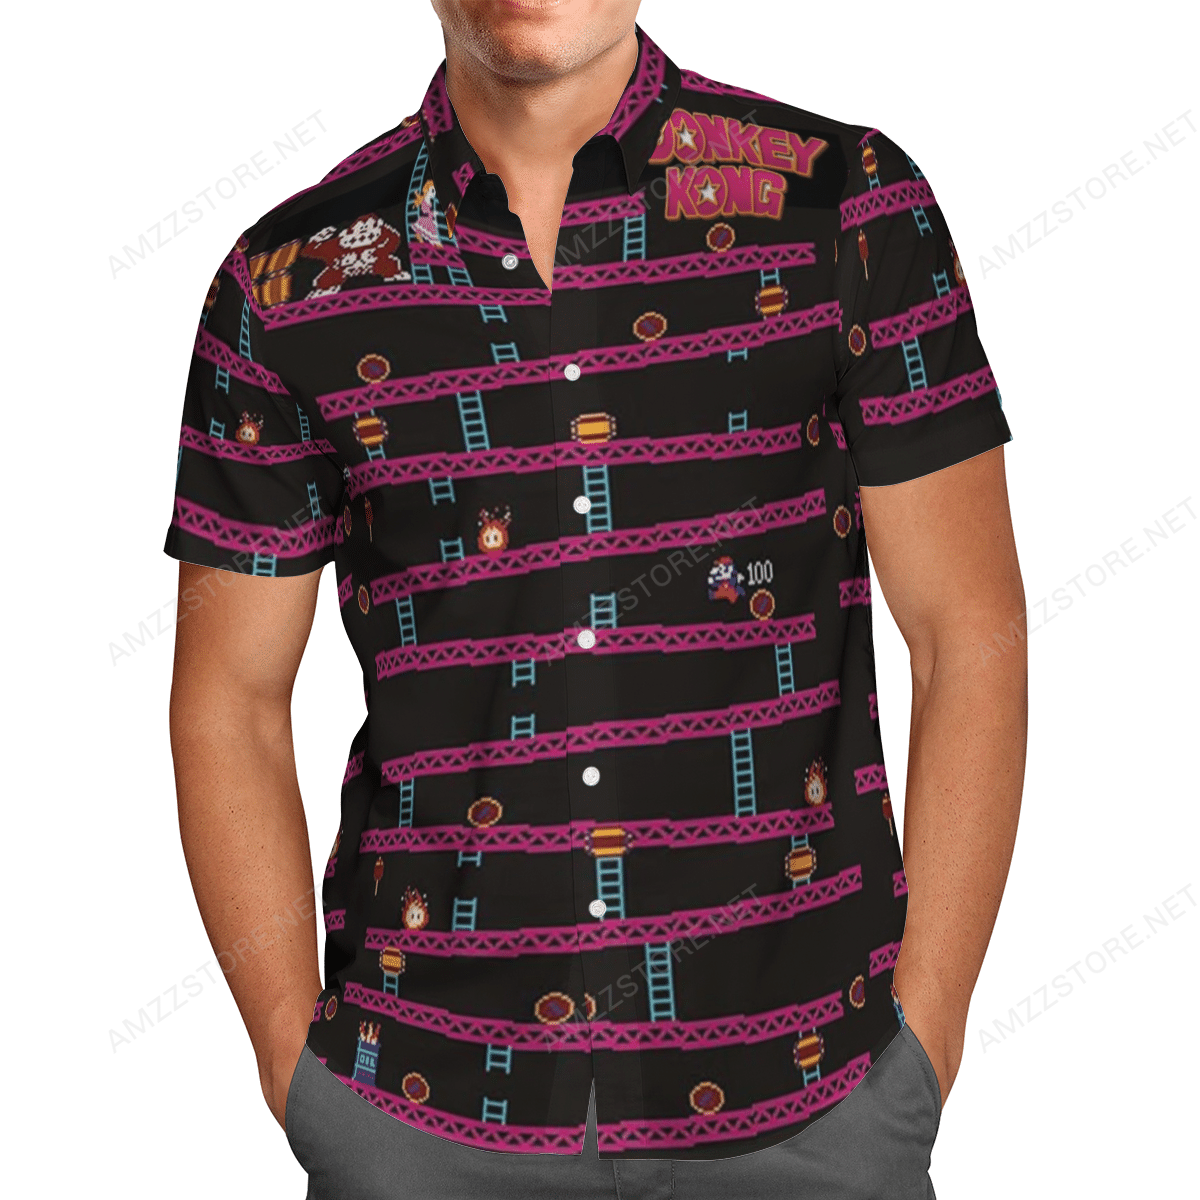 Donkey Kong Game Hawaiian Shirt